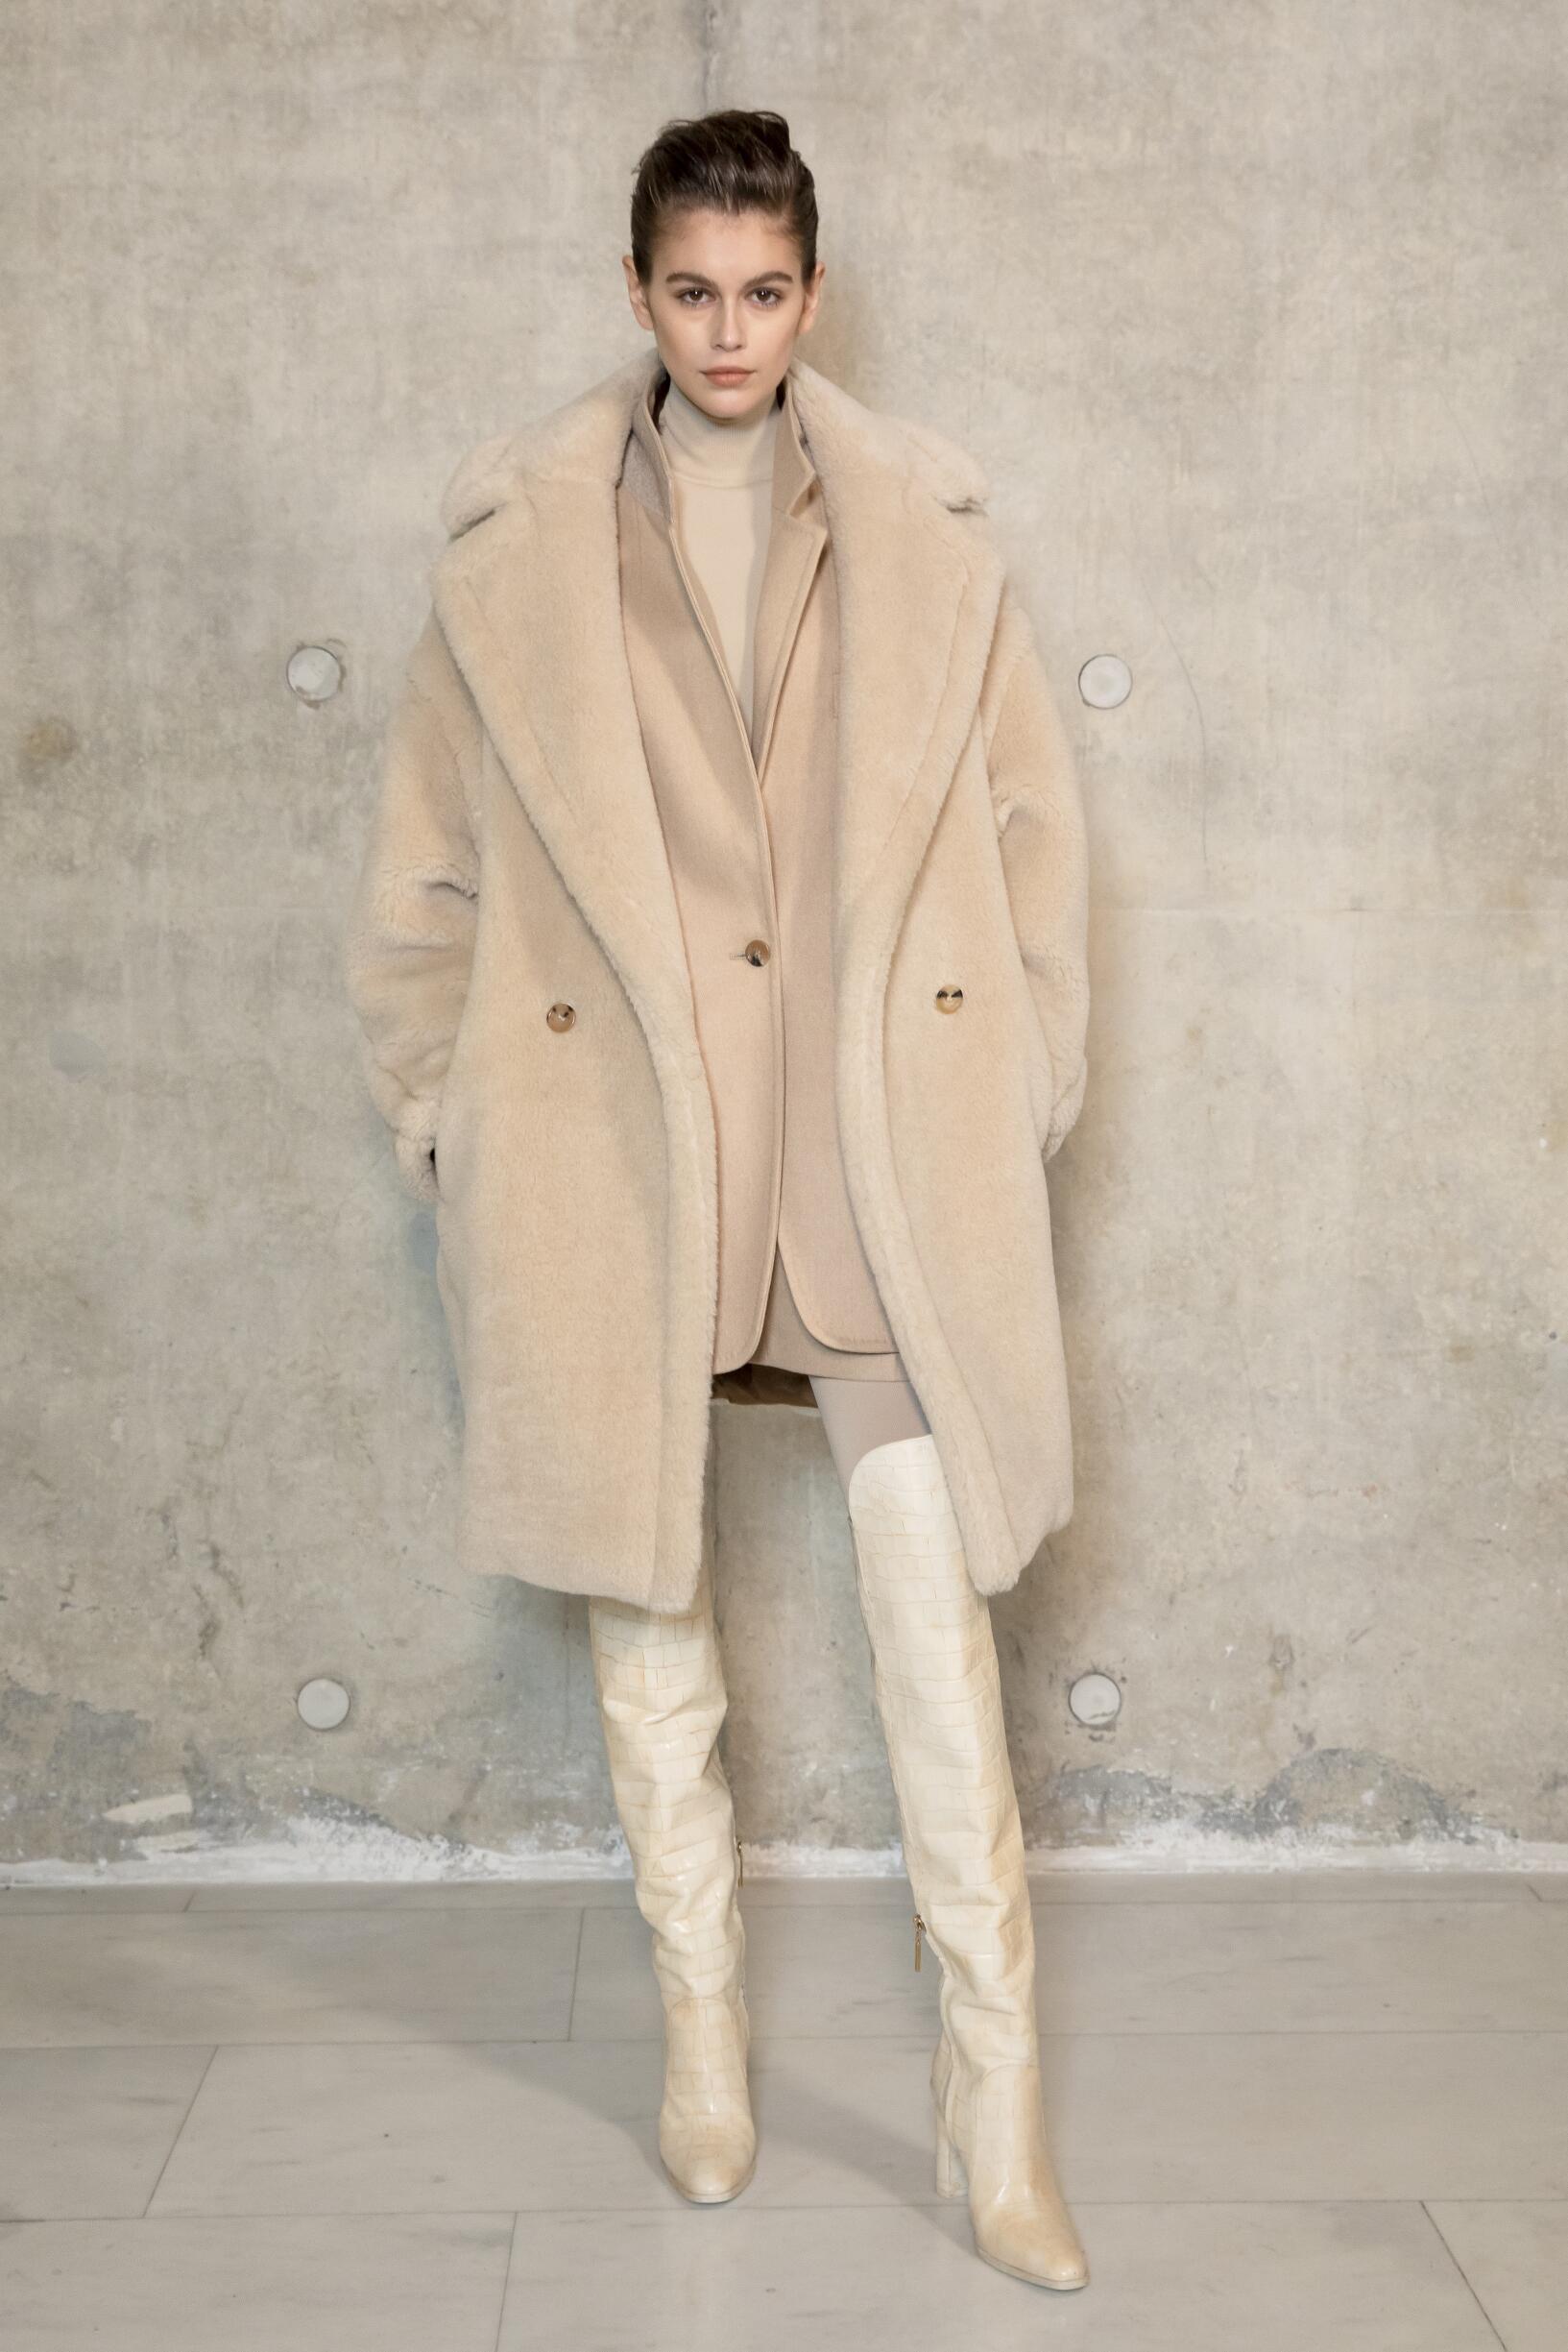 Backstage Max Mara Model Fall 2019 Collection Milan Fashion Week